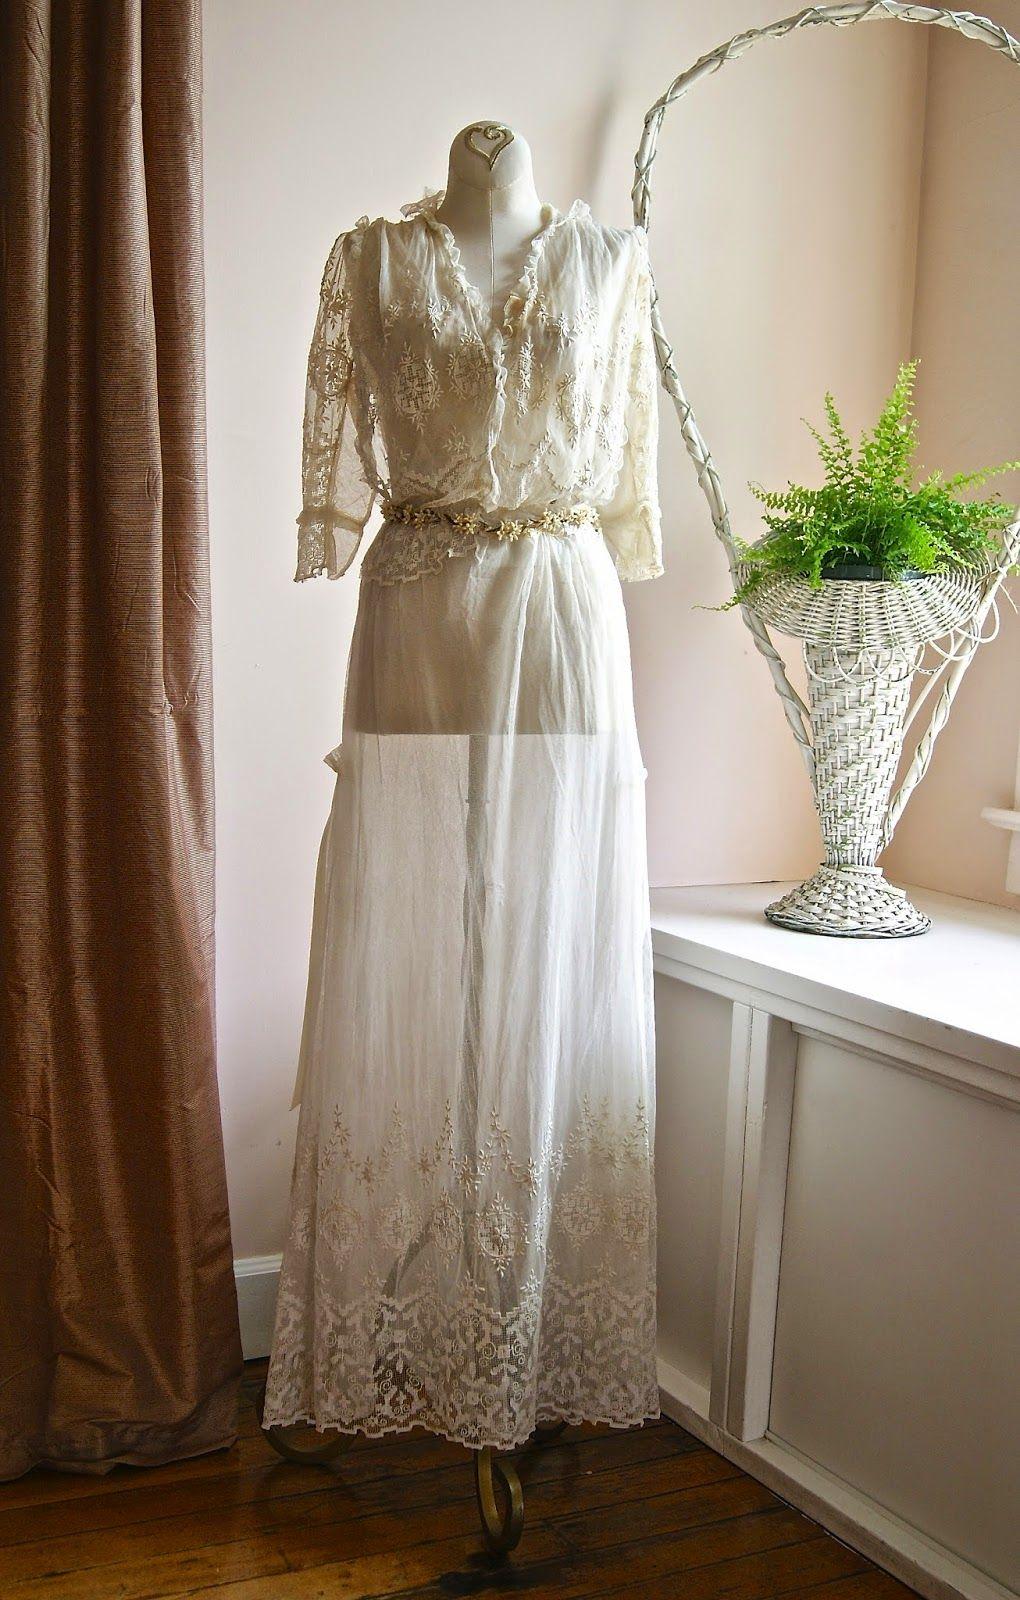 Xtabay Vintage Clothing Boutique - Portland, Oregon | Vintage ...